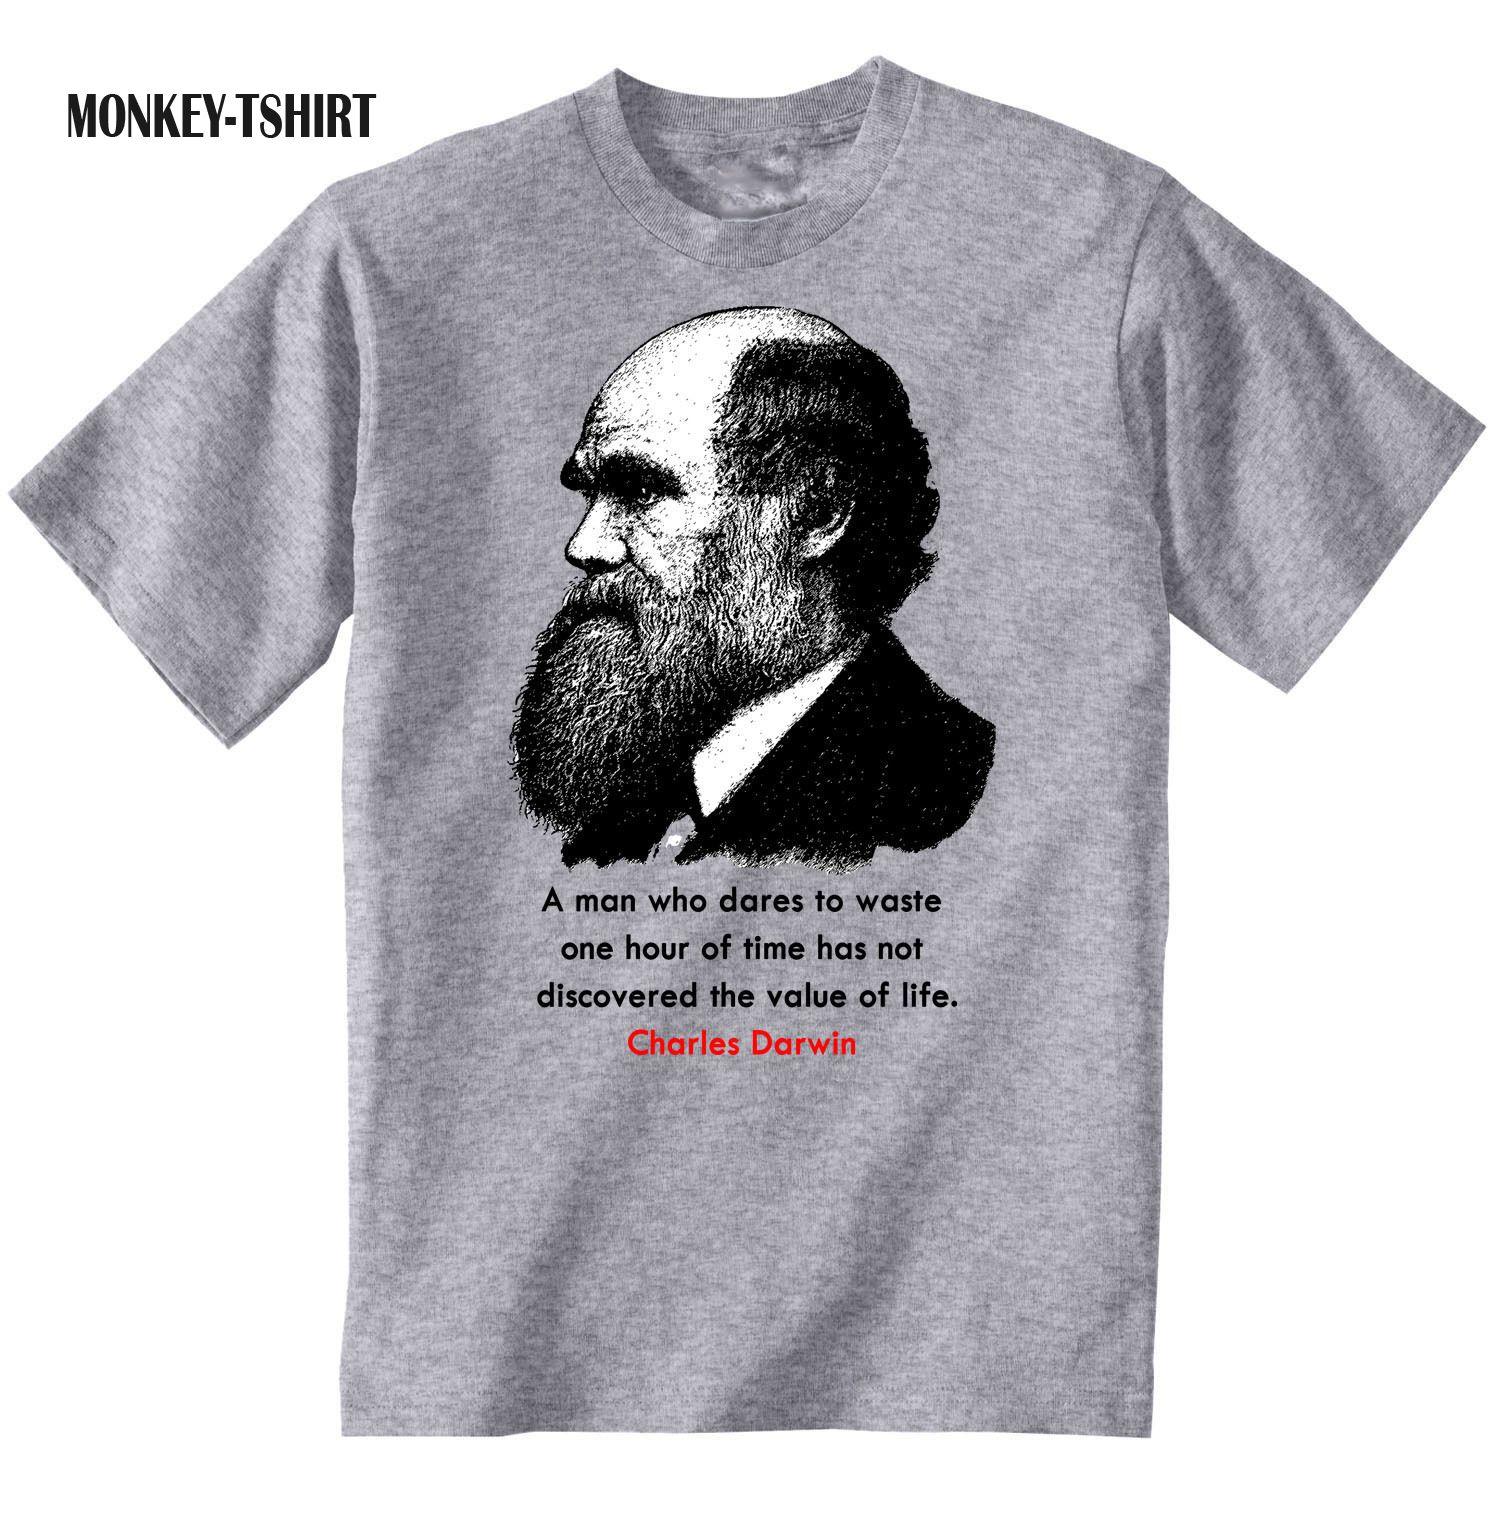 Online Tshirt Printing Business - DREAMWORKS